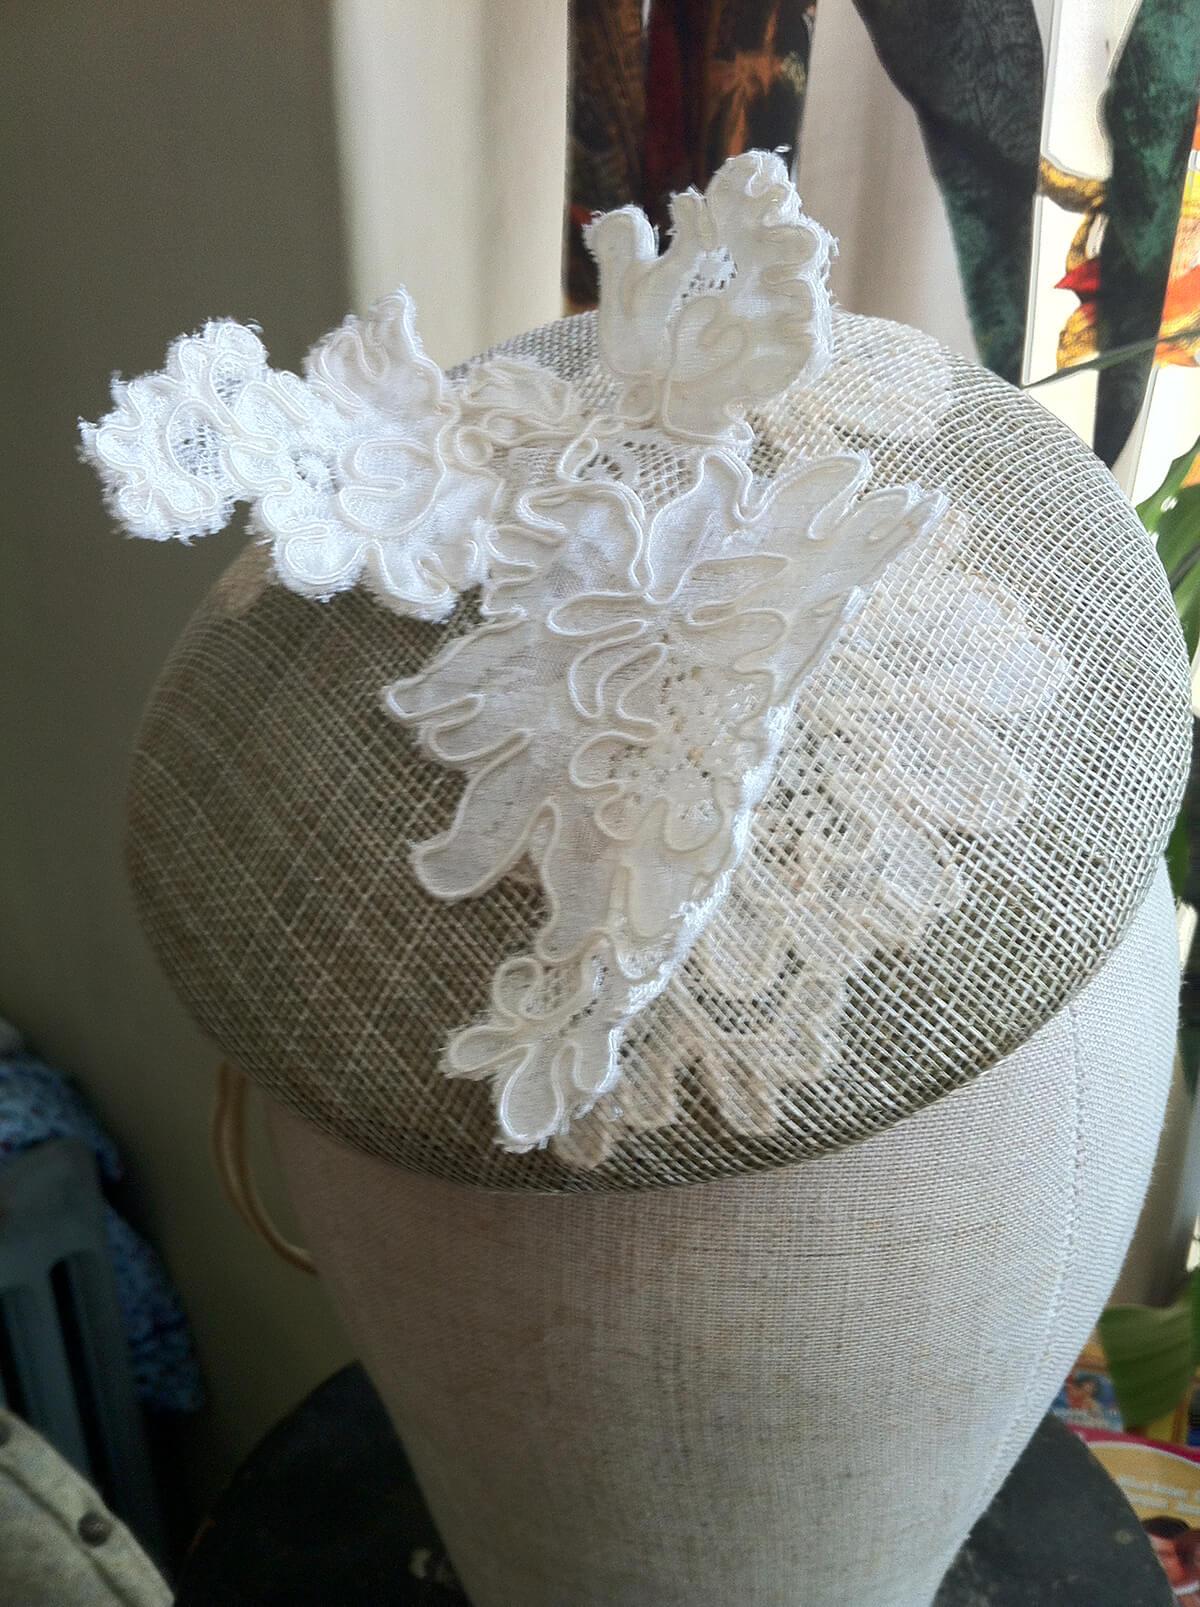 Lace work bespoke hat.